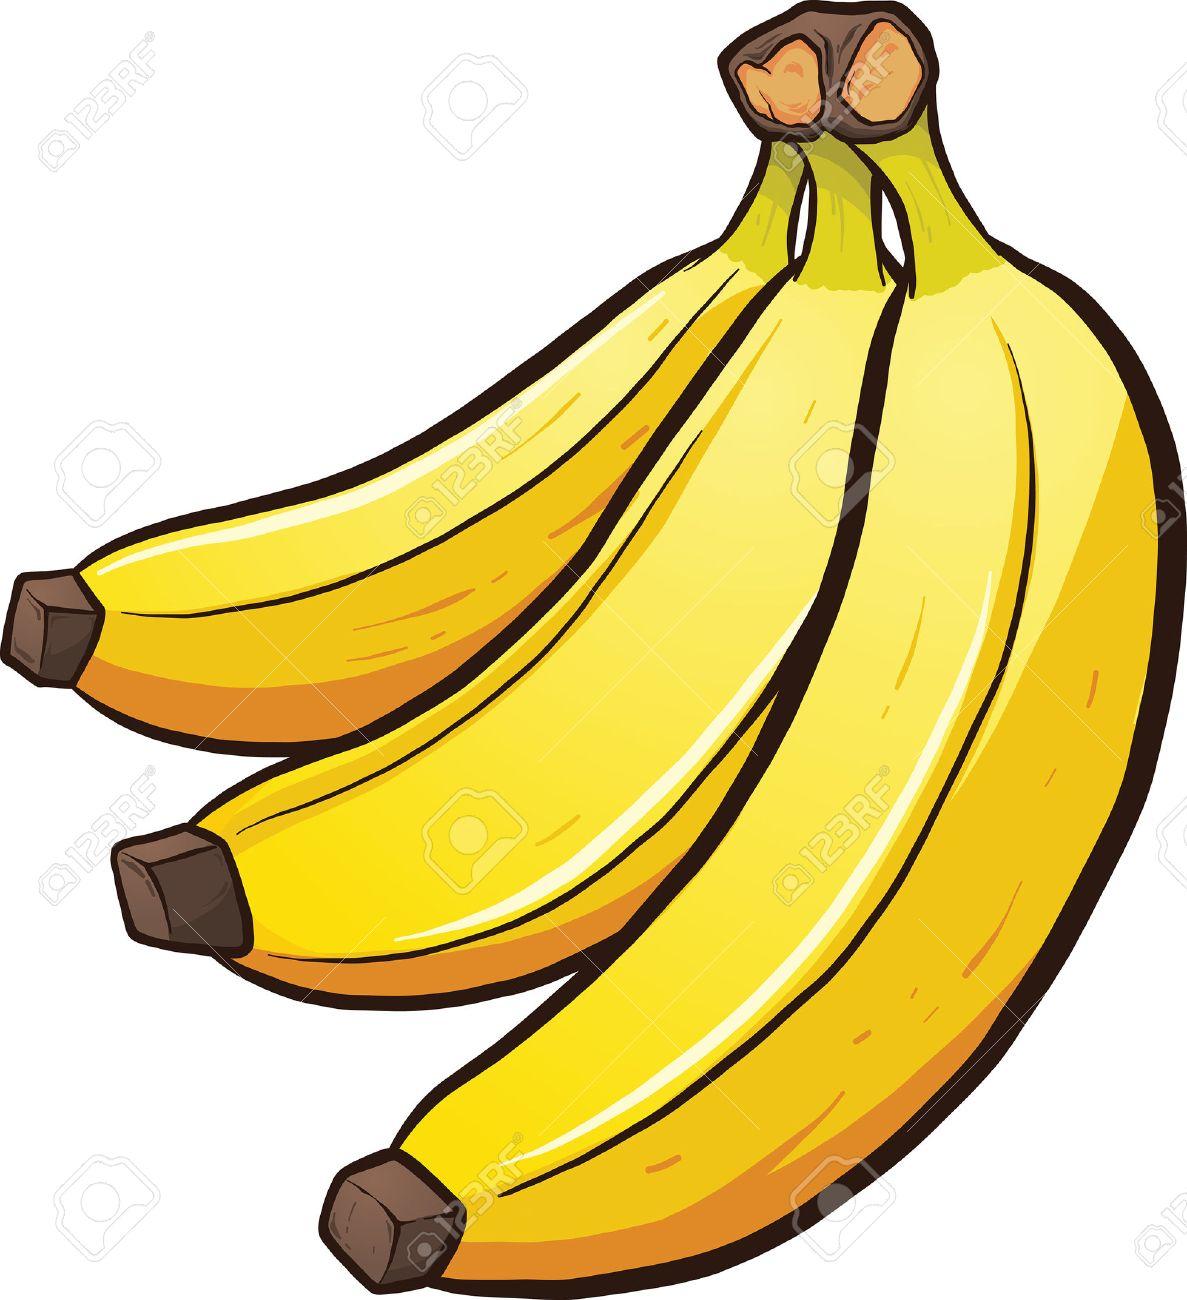 Bananas cilpart fashionable design. Banana clipart cartoon